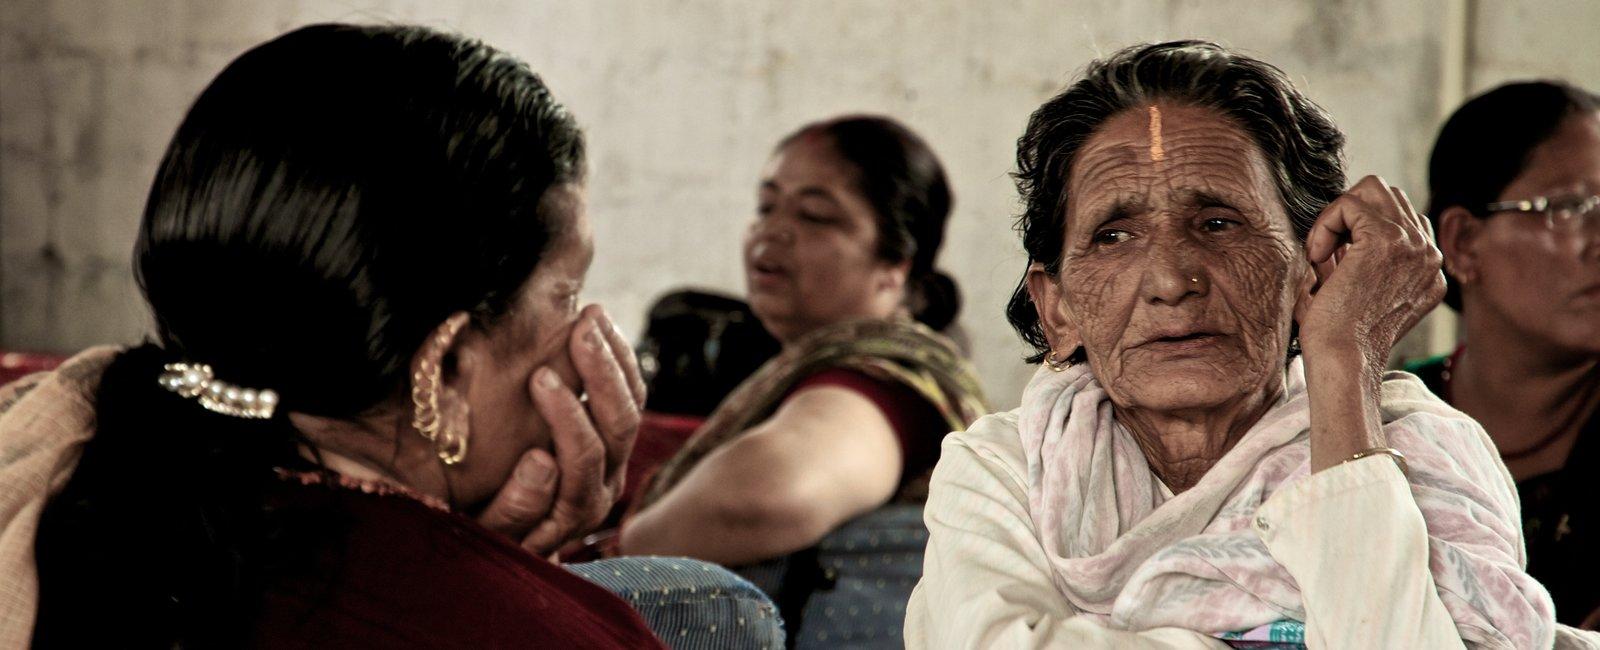 Sawan Tailor - Dentistry Electives in Kathmandu, Nepal